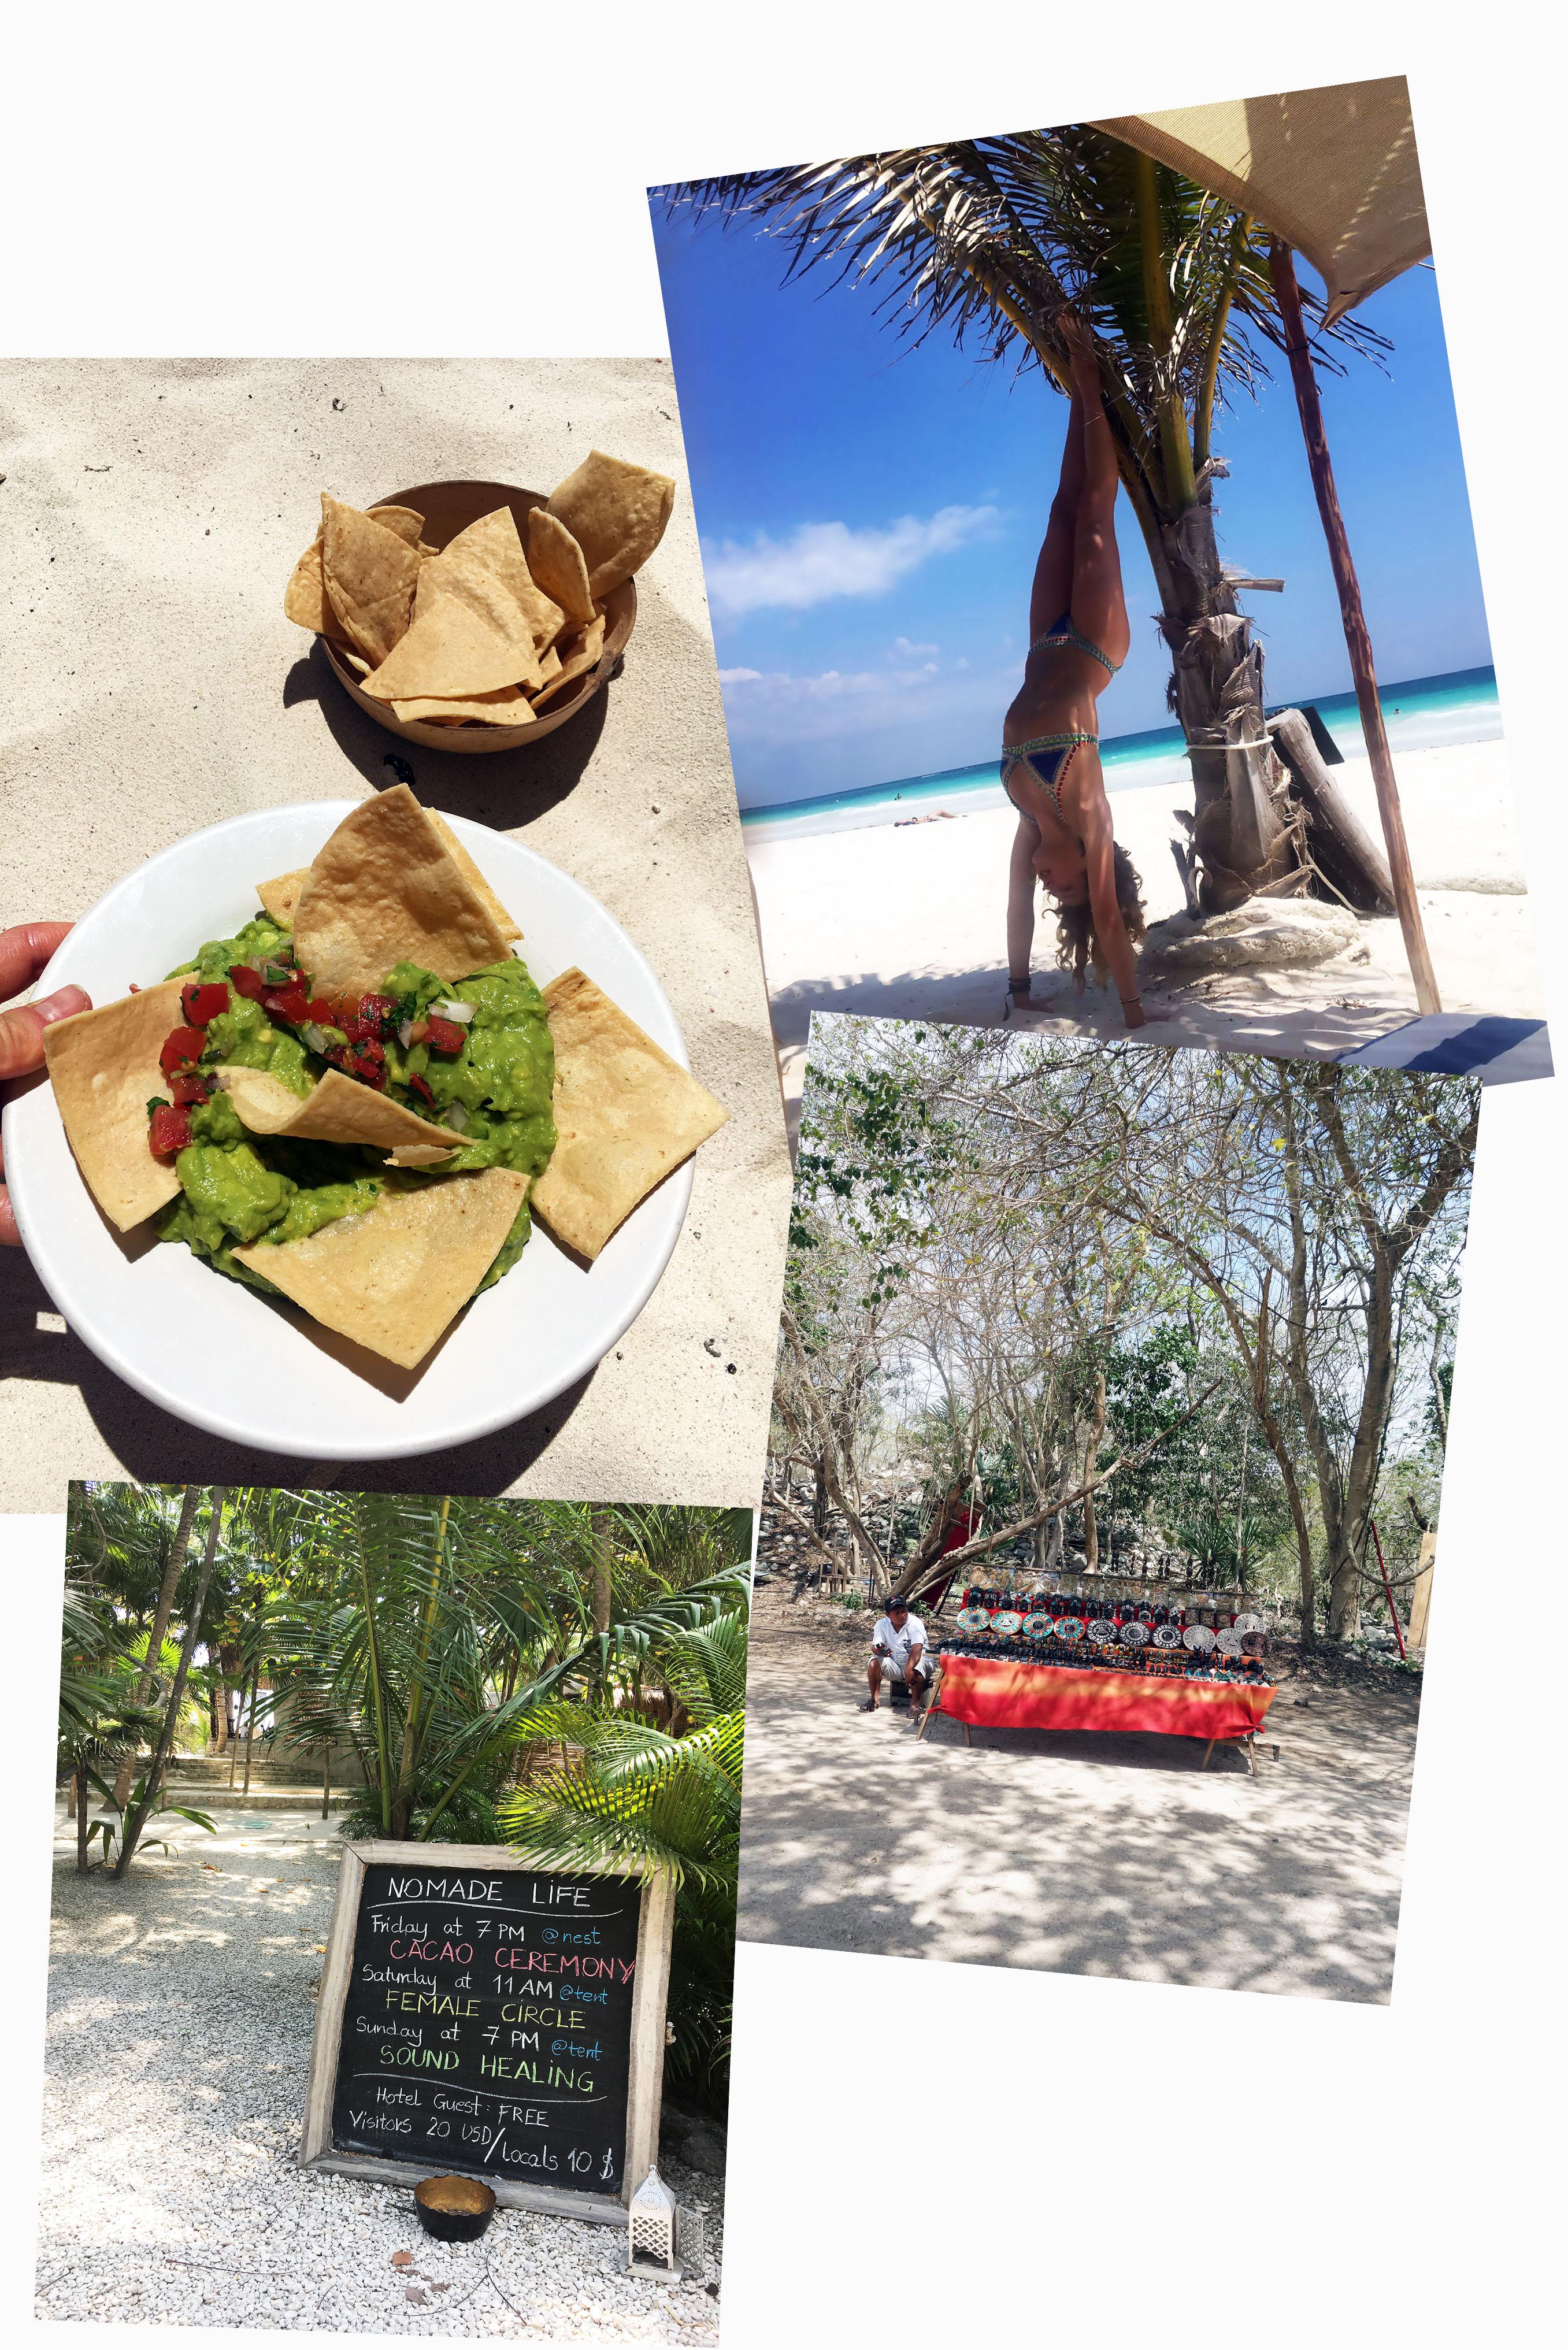 tess ward, mexico, travel, howlita, tulum, del cielo, hartwood, food, tacos, beetroot, avocado, creme, bar, cocktails, dinner, beach, guacamole, avocado